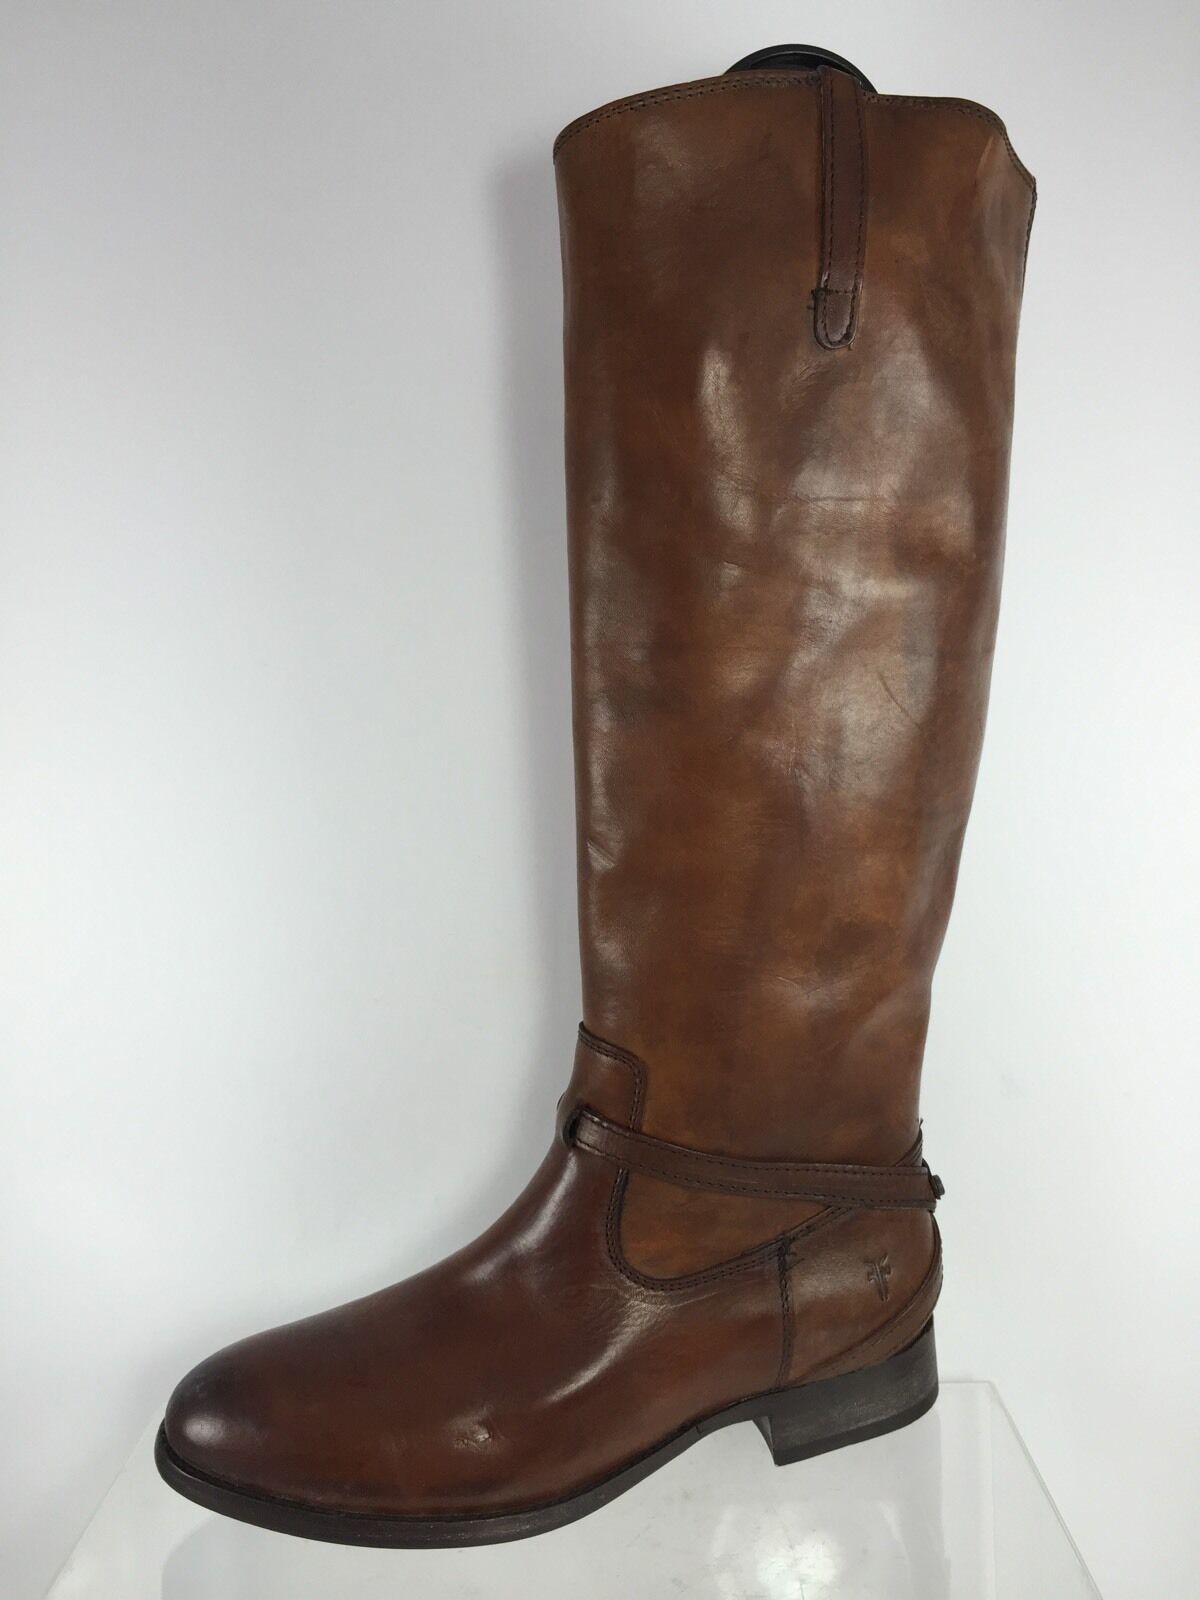 sport caldi Frye Frye Frye donna Marrone Leather Knee stivali 9 B  edizione limitata a caldo